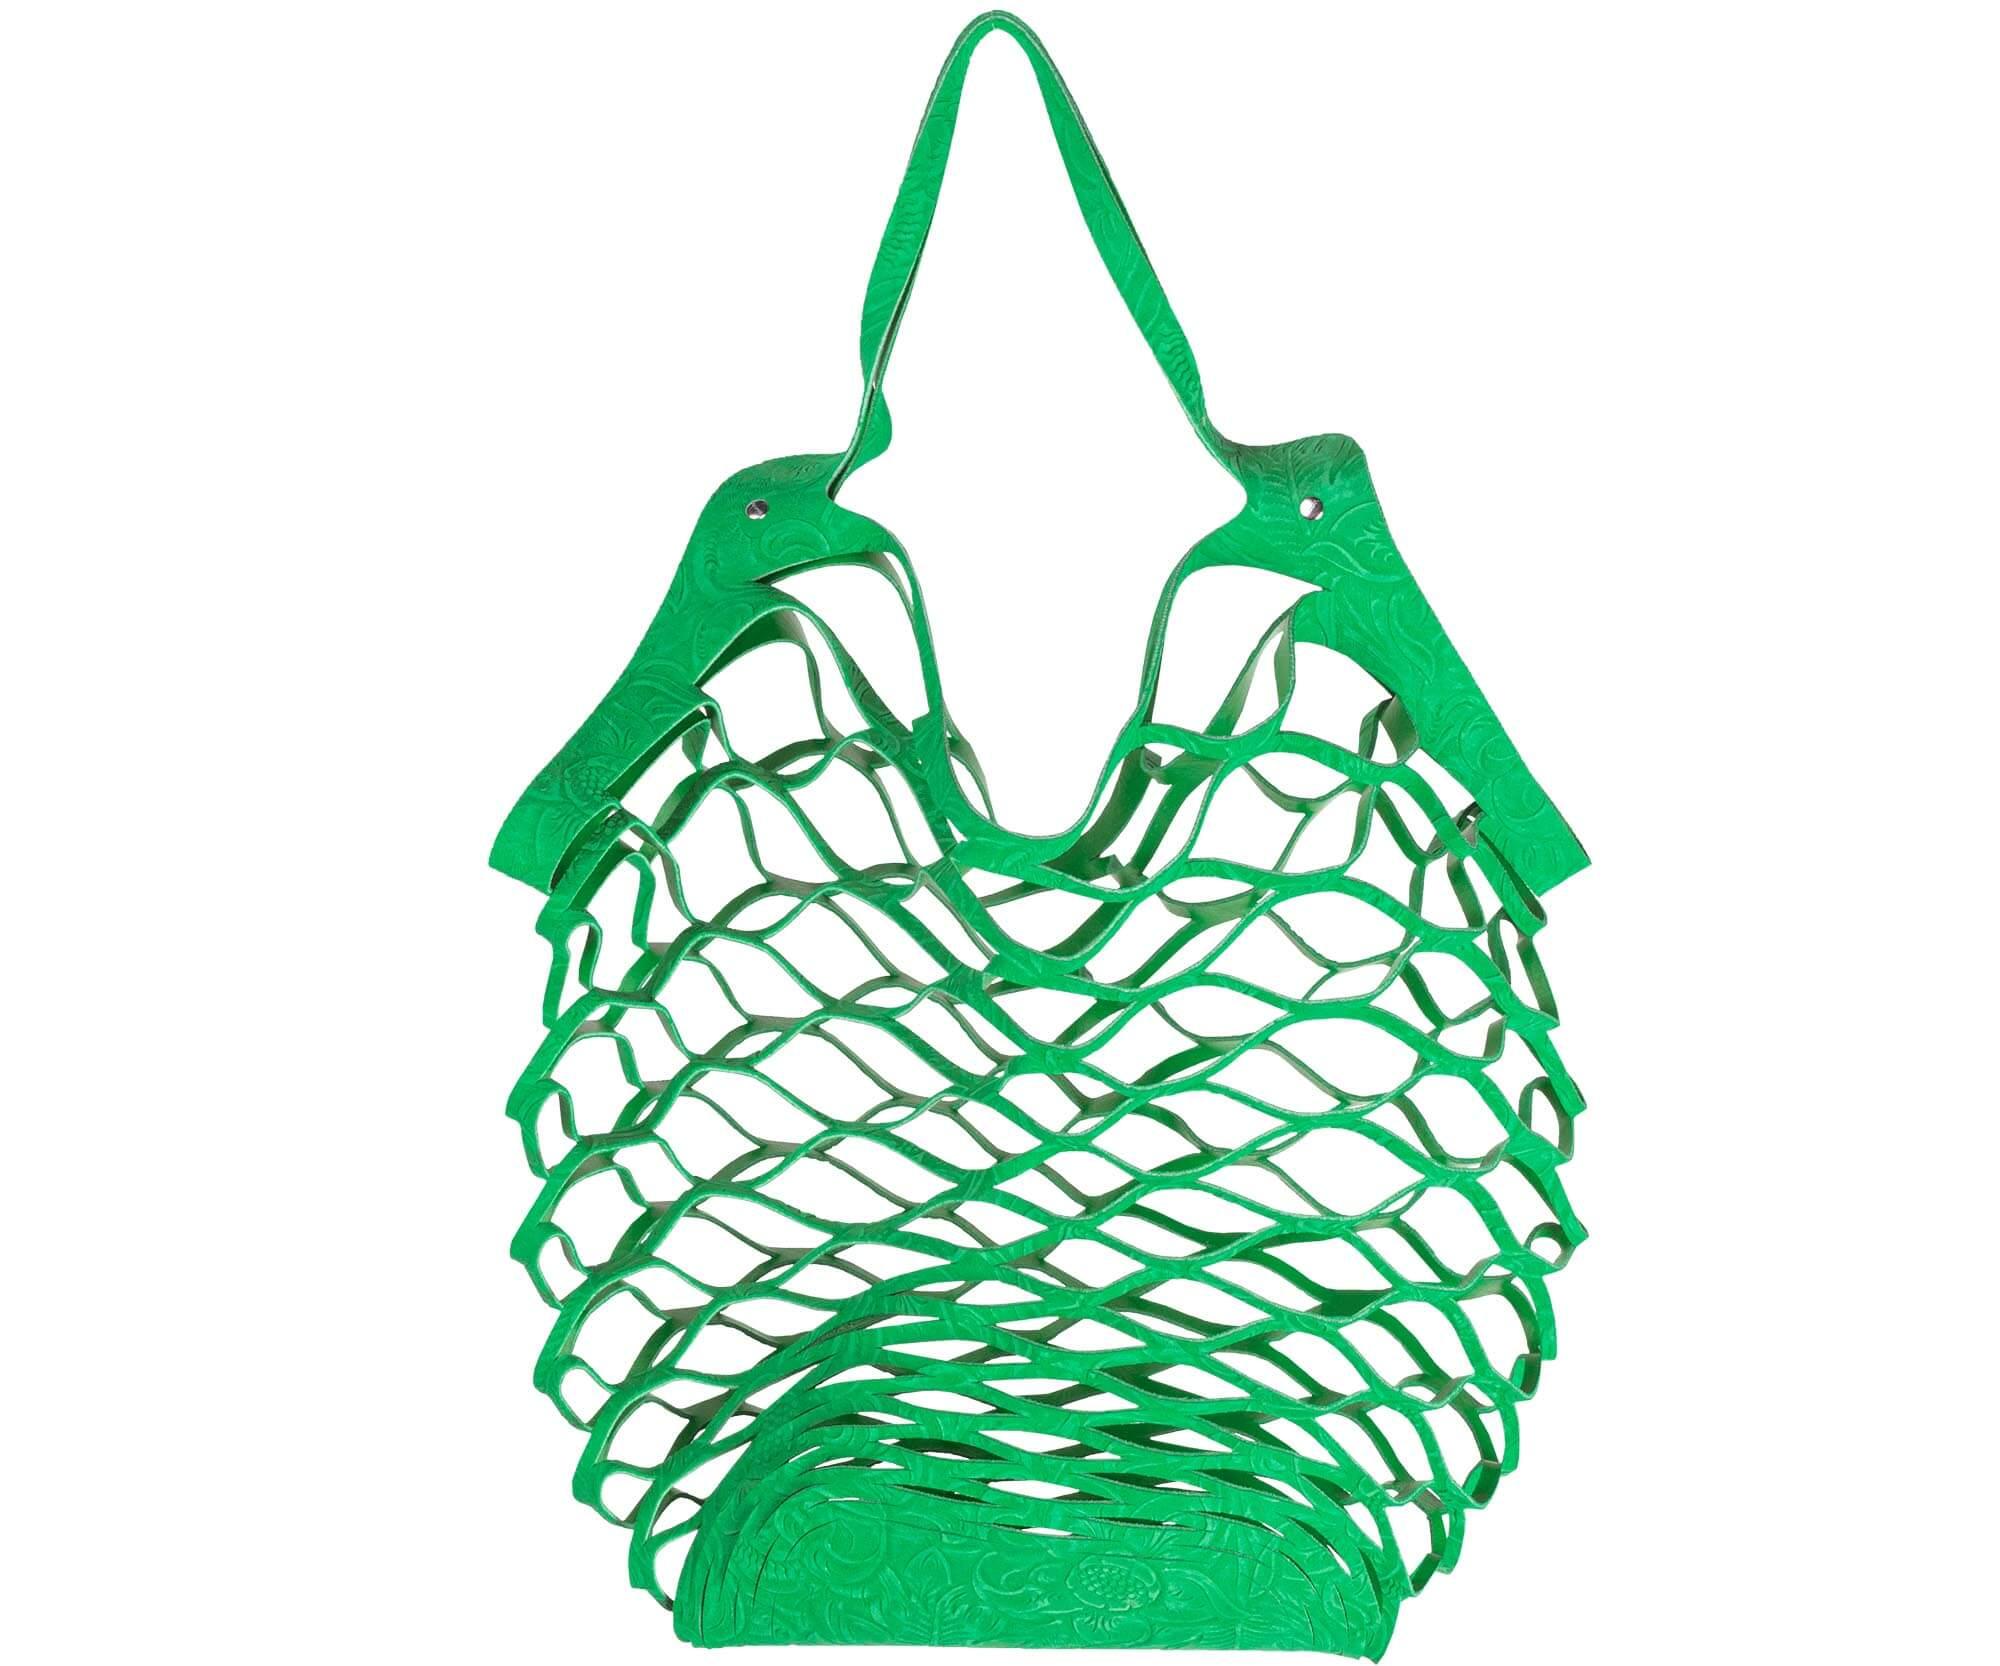 Vanzetti cut out bag green